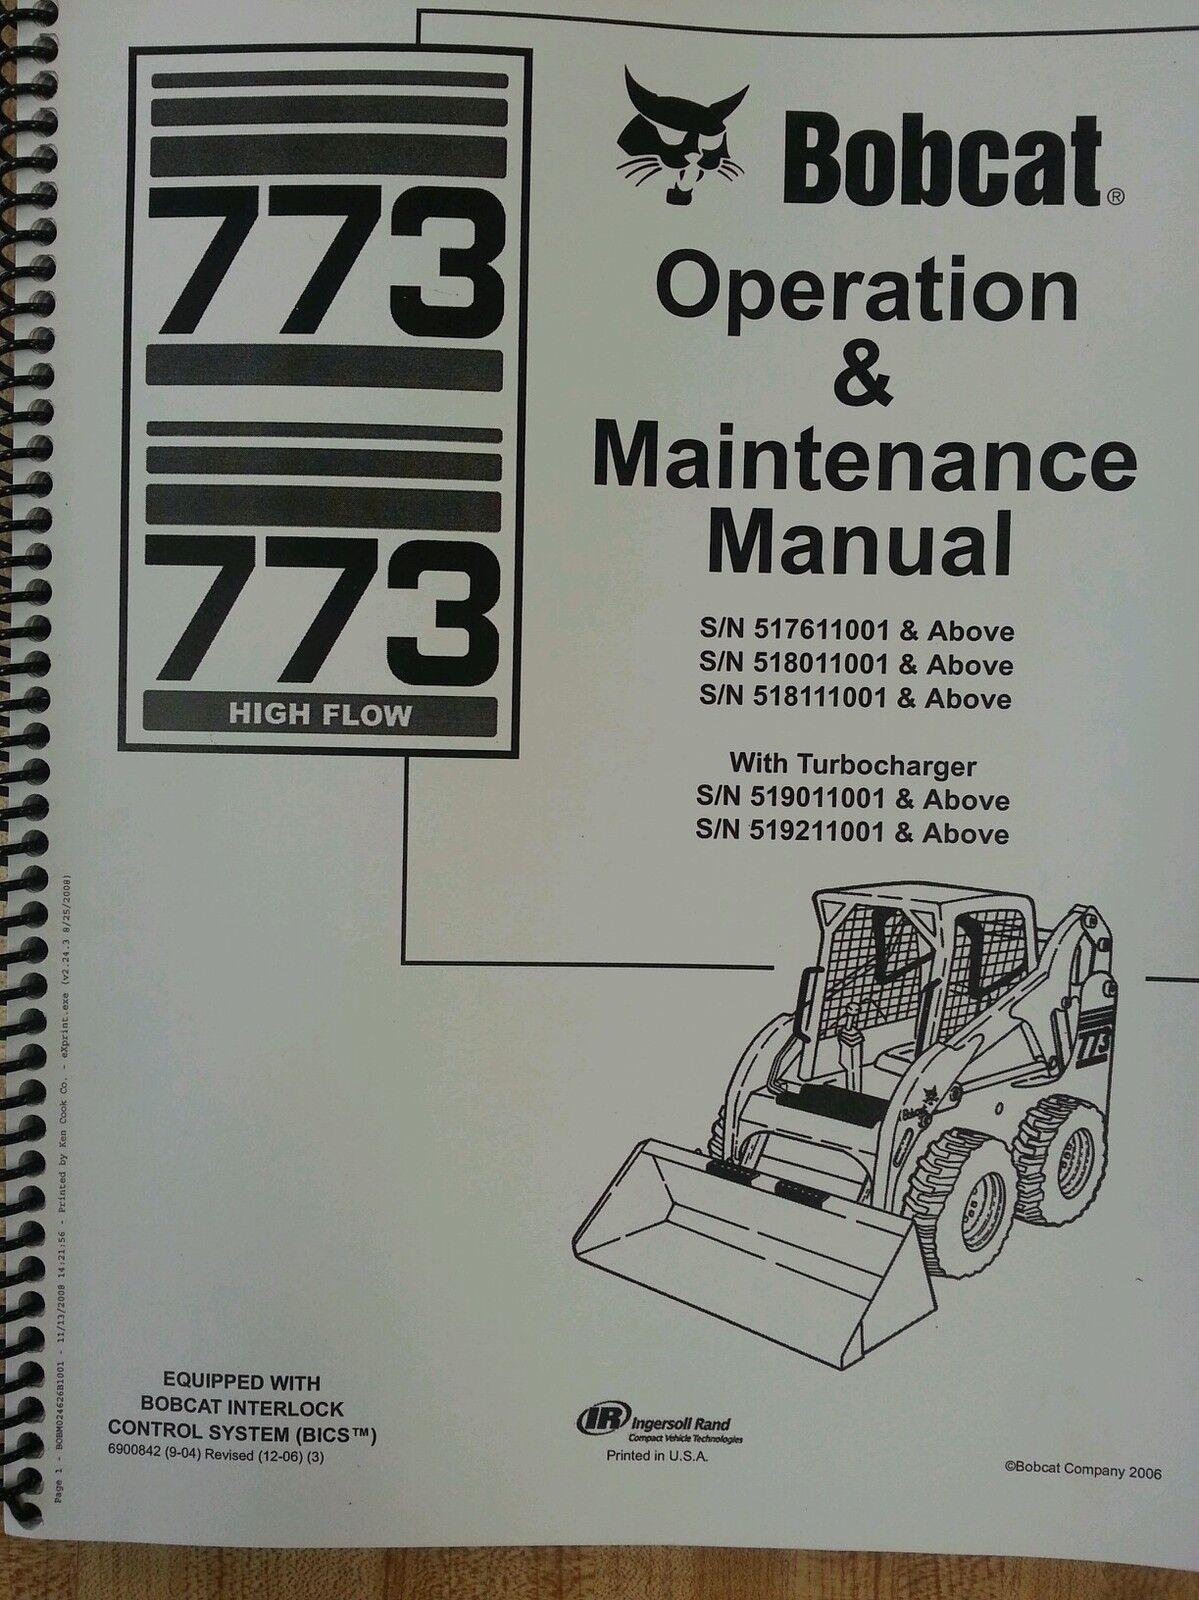 bobcat 773g skid steer loader operators operation maintenance manual rh ebay com bobcat 773g service manual free bobcat 773 repair manual